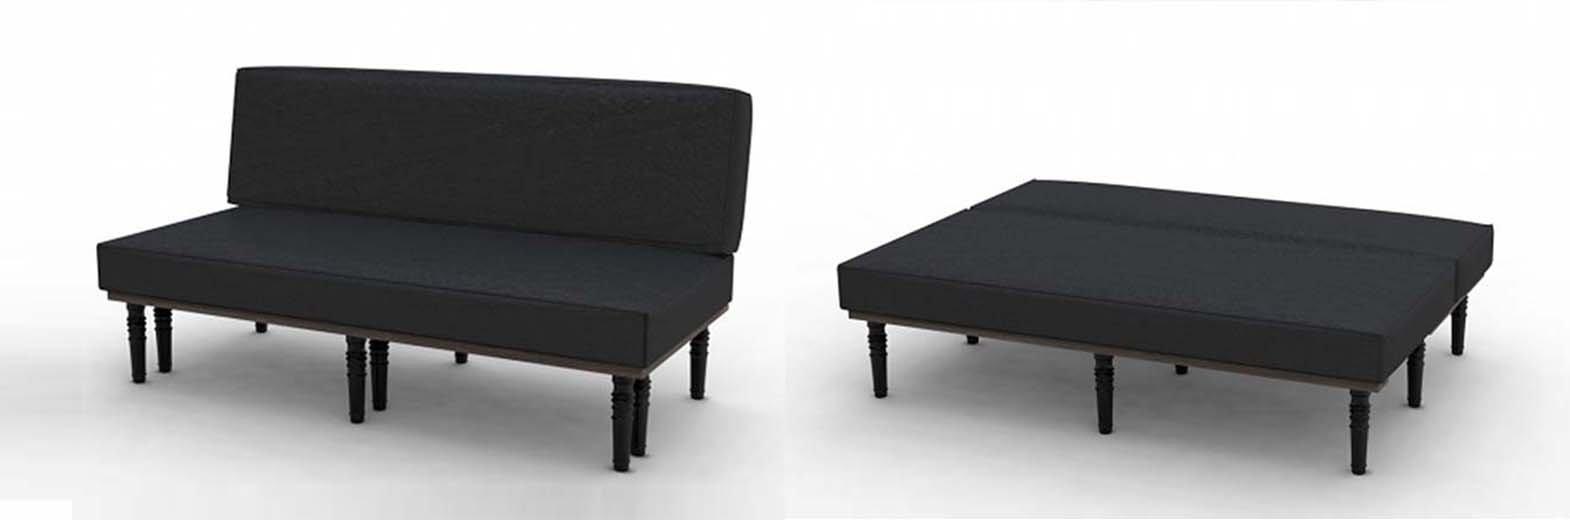 Bench sofa bed sofa bed design ottoman harvey norman for Sofa stool design